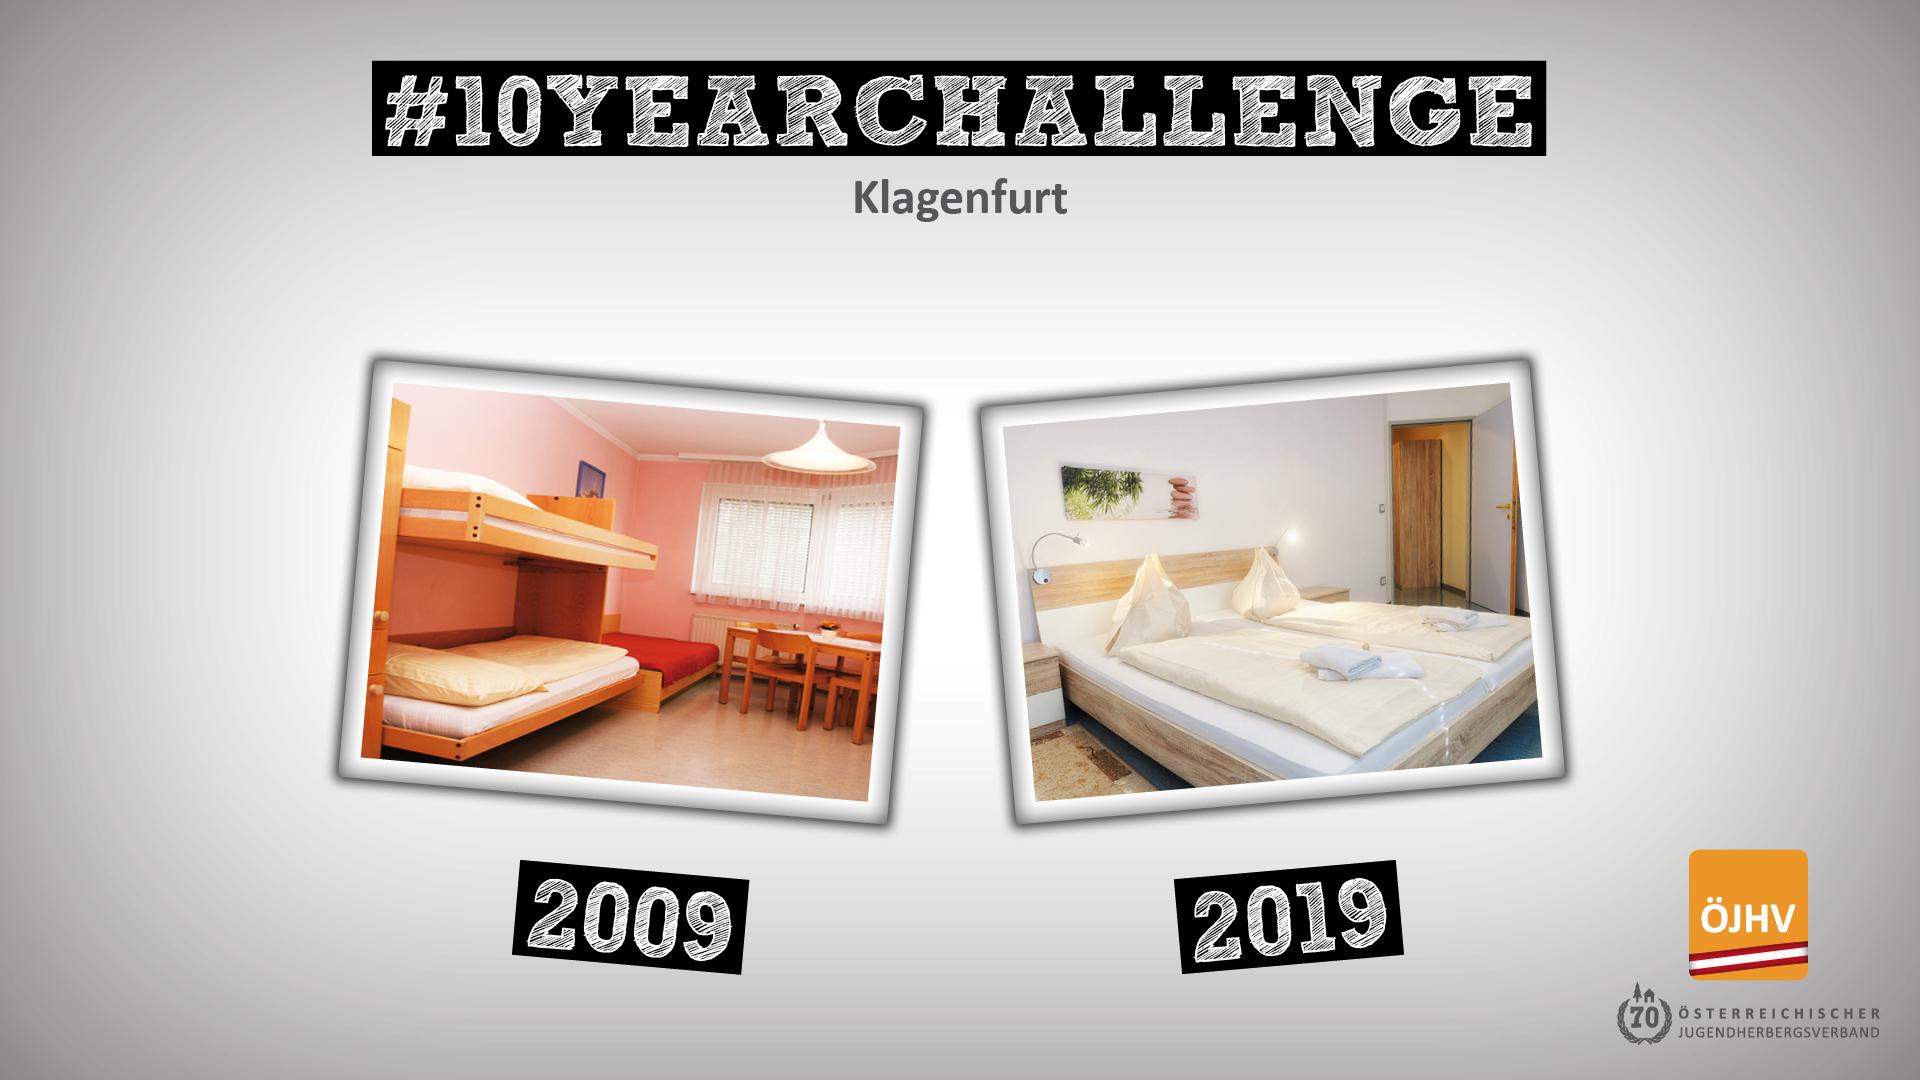 Jugendherbergsverband #10YearChallenge Klagenfurt